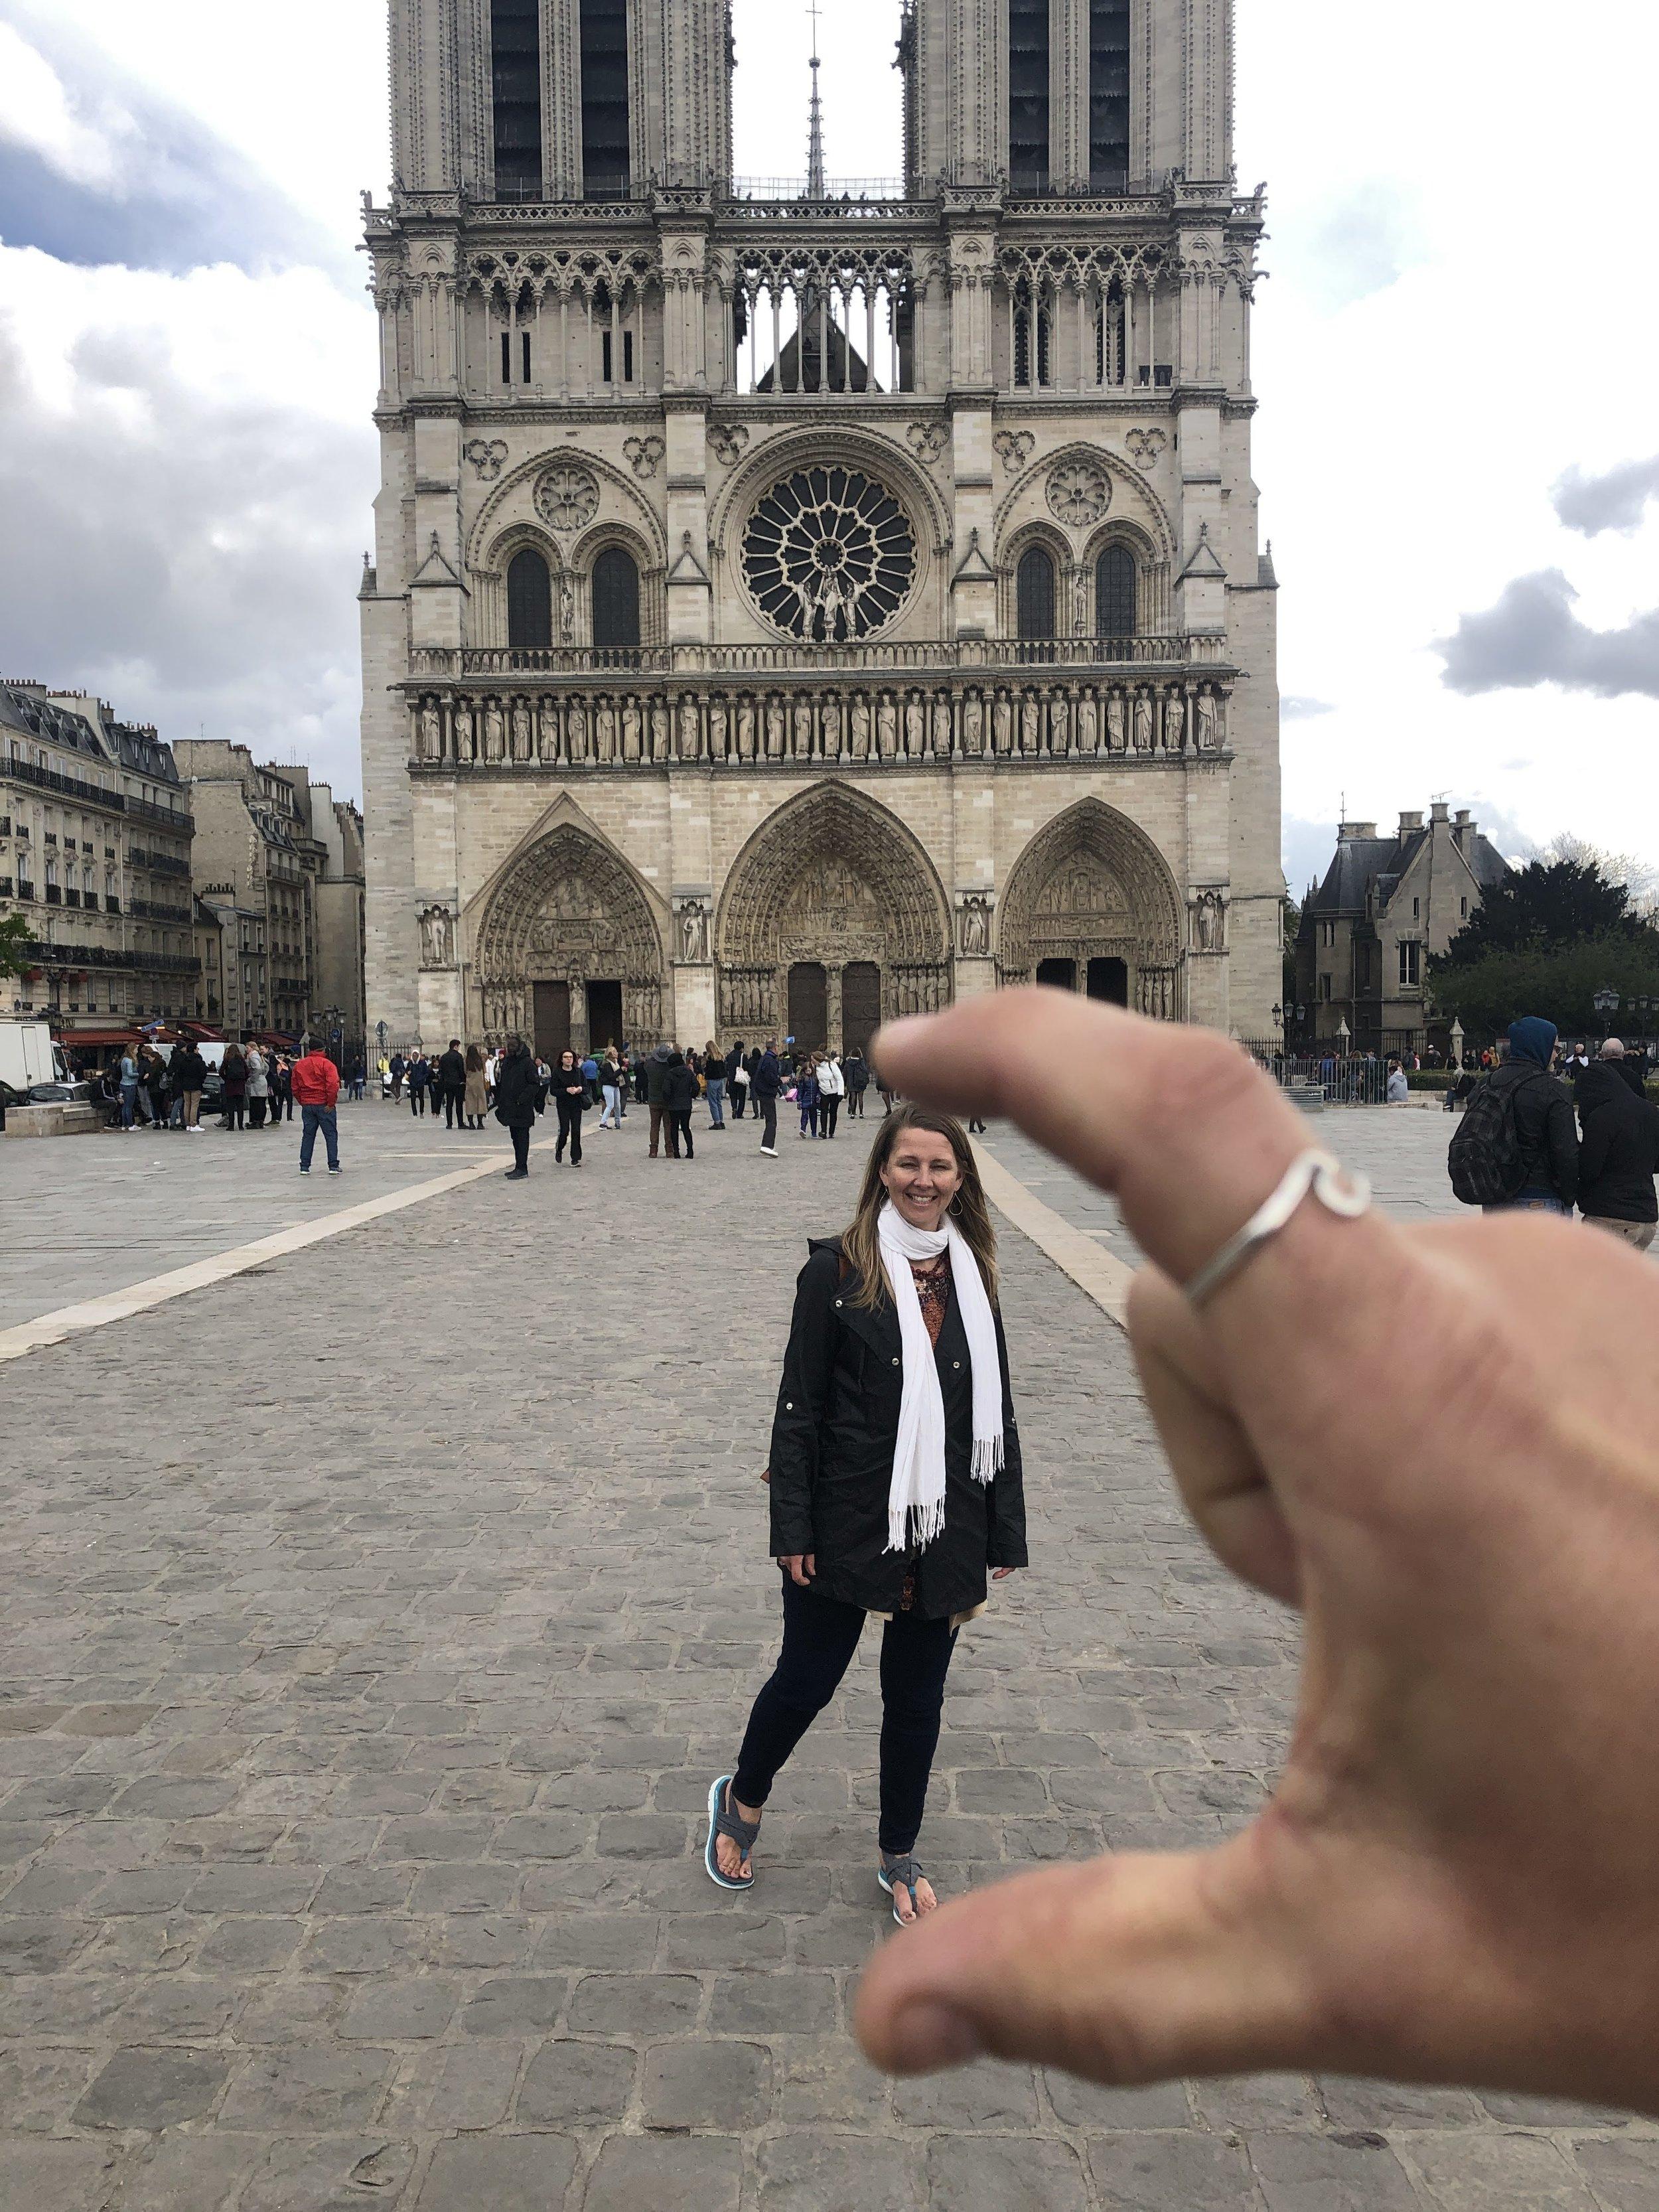 paris-notredame-squish.jpg